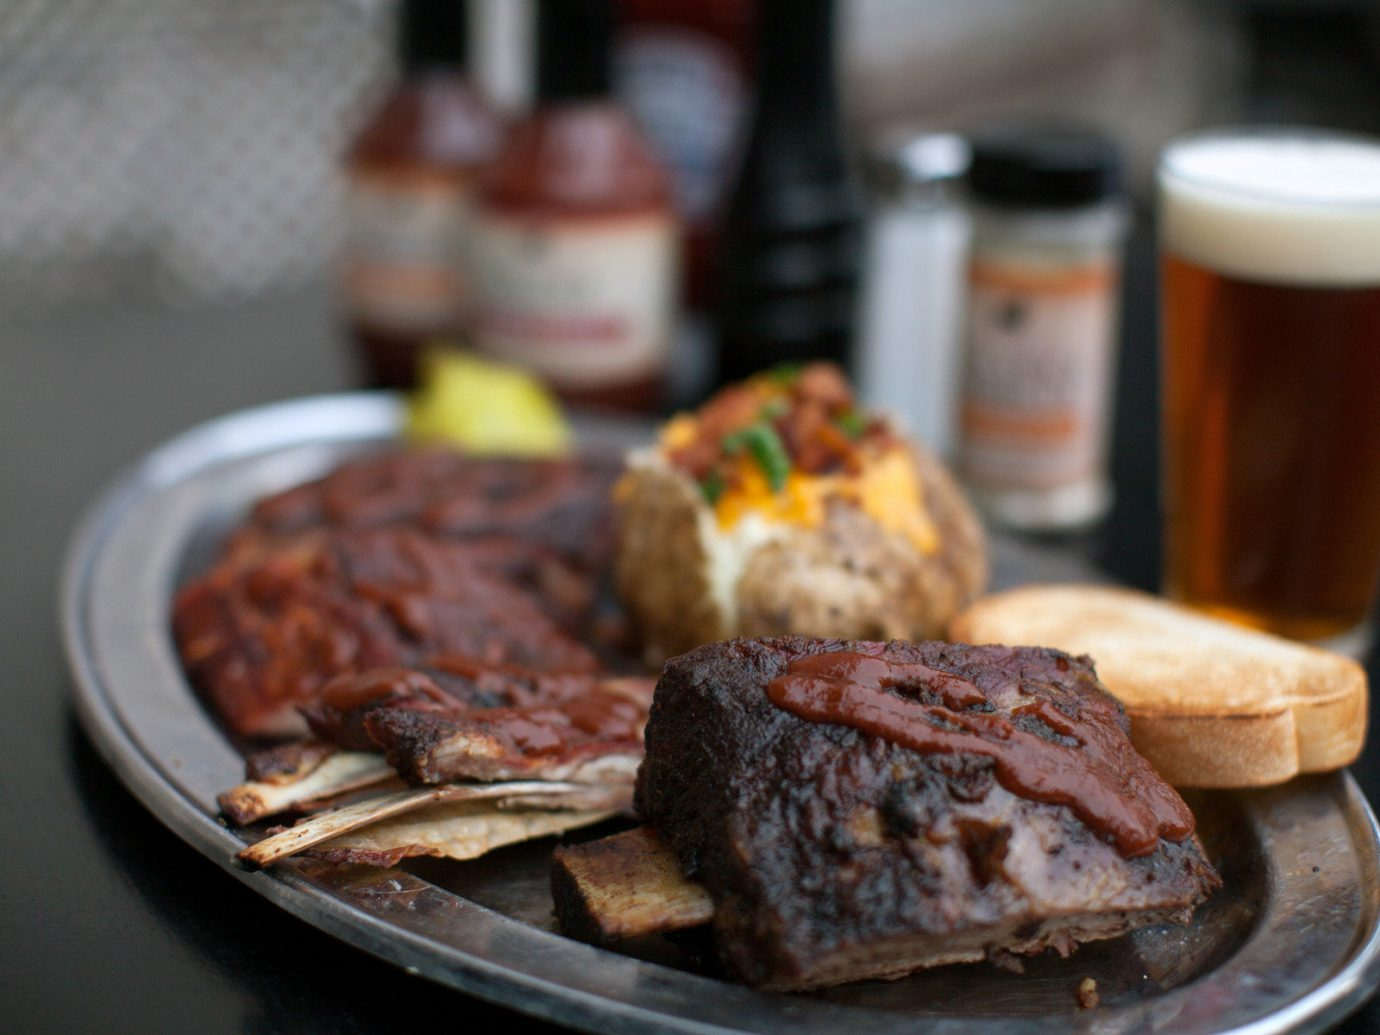 City Kansas City Midwest Trip Ideas food table plate dish meat meal breakfast steak cuisine produce lunch